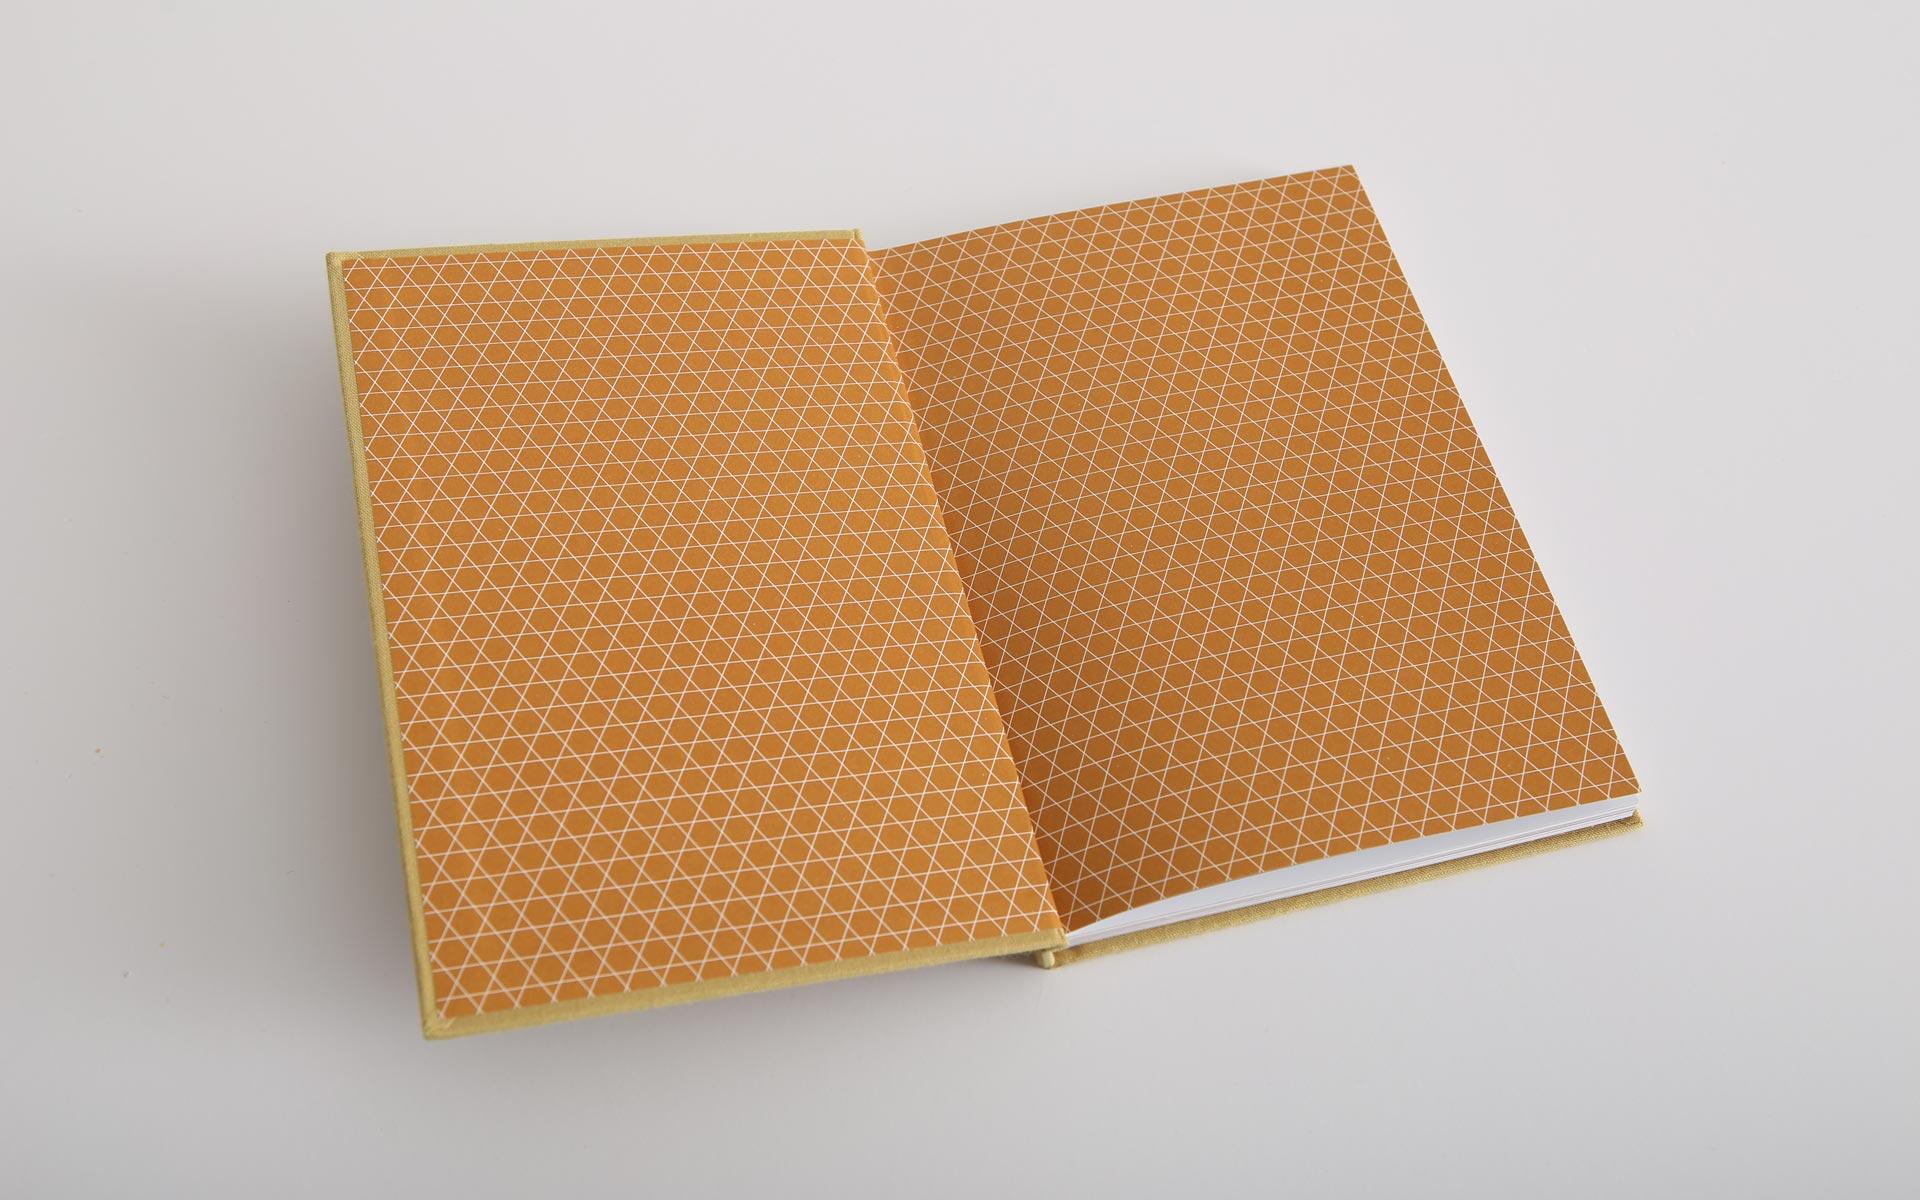 shumiatcher-ubc-sala-book-design-2